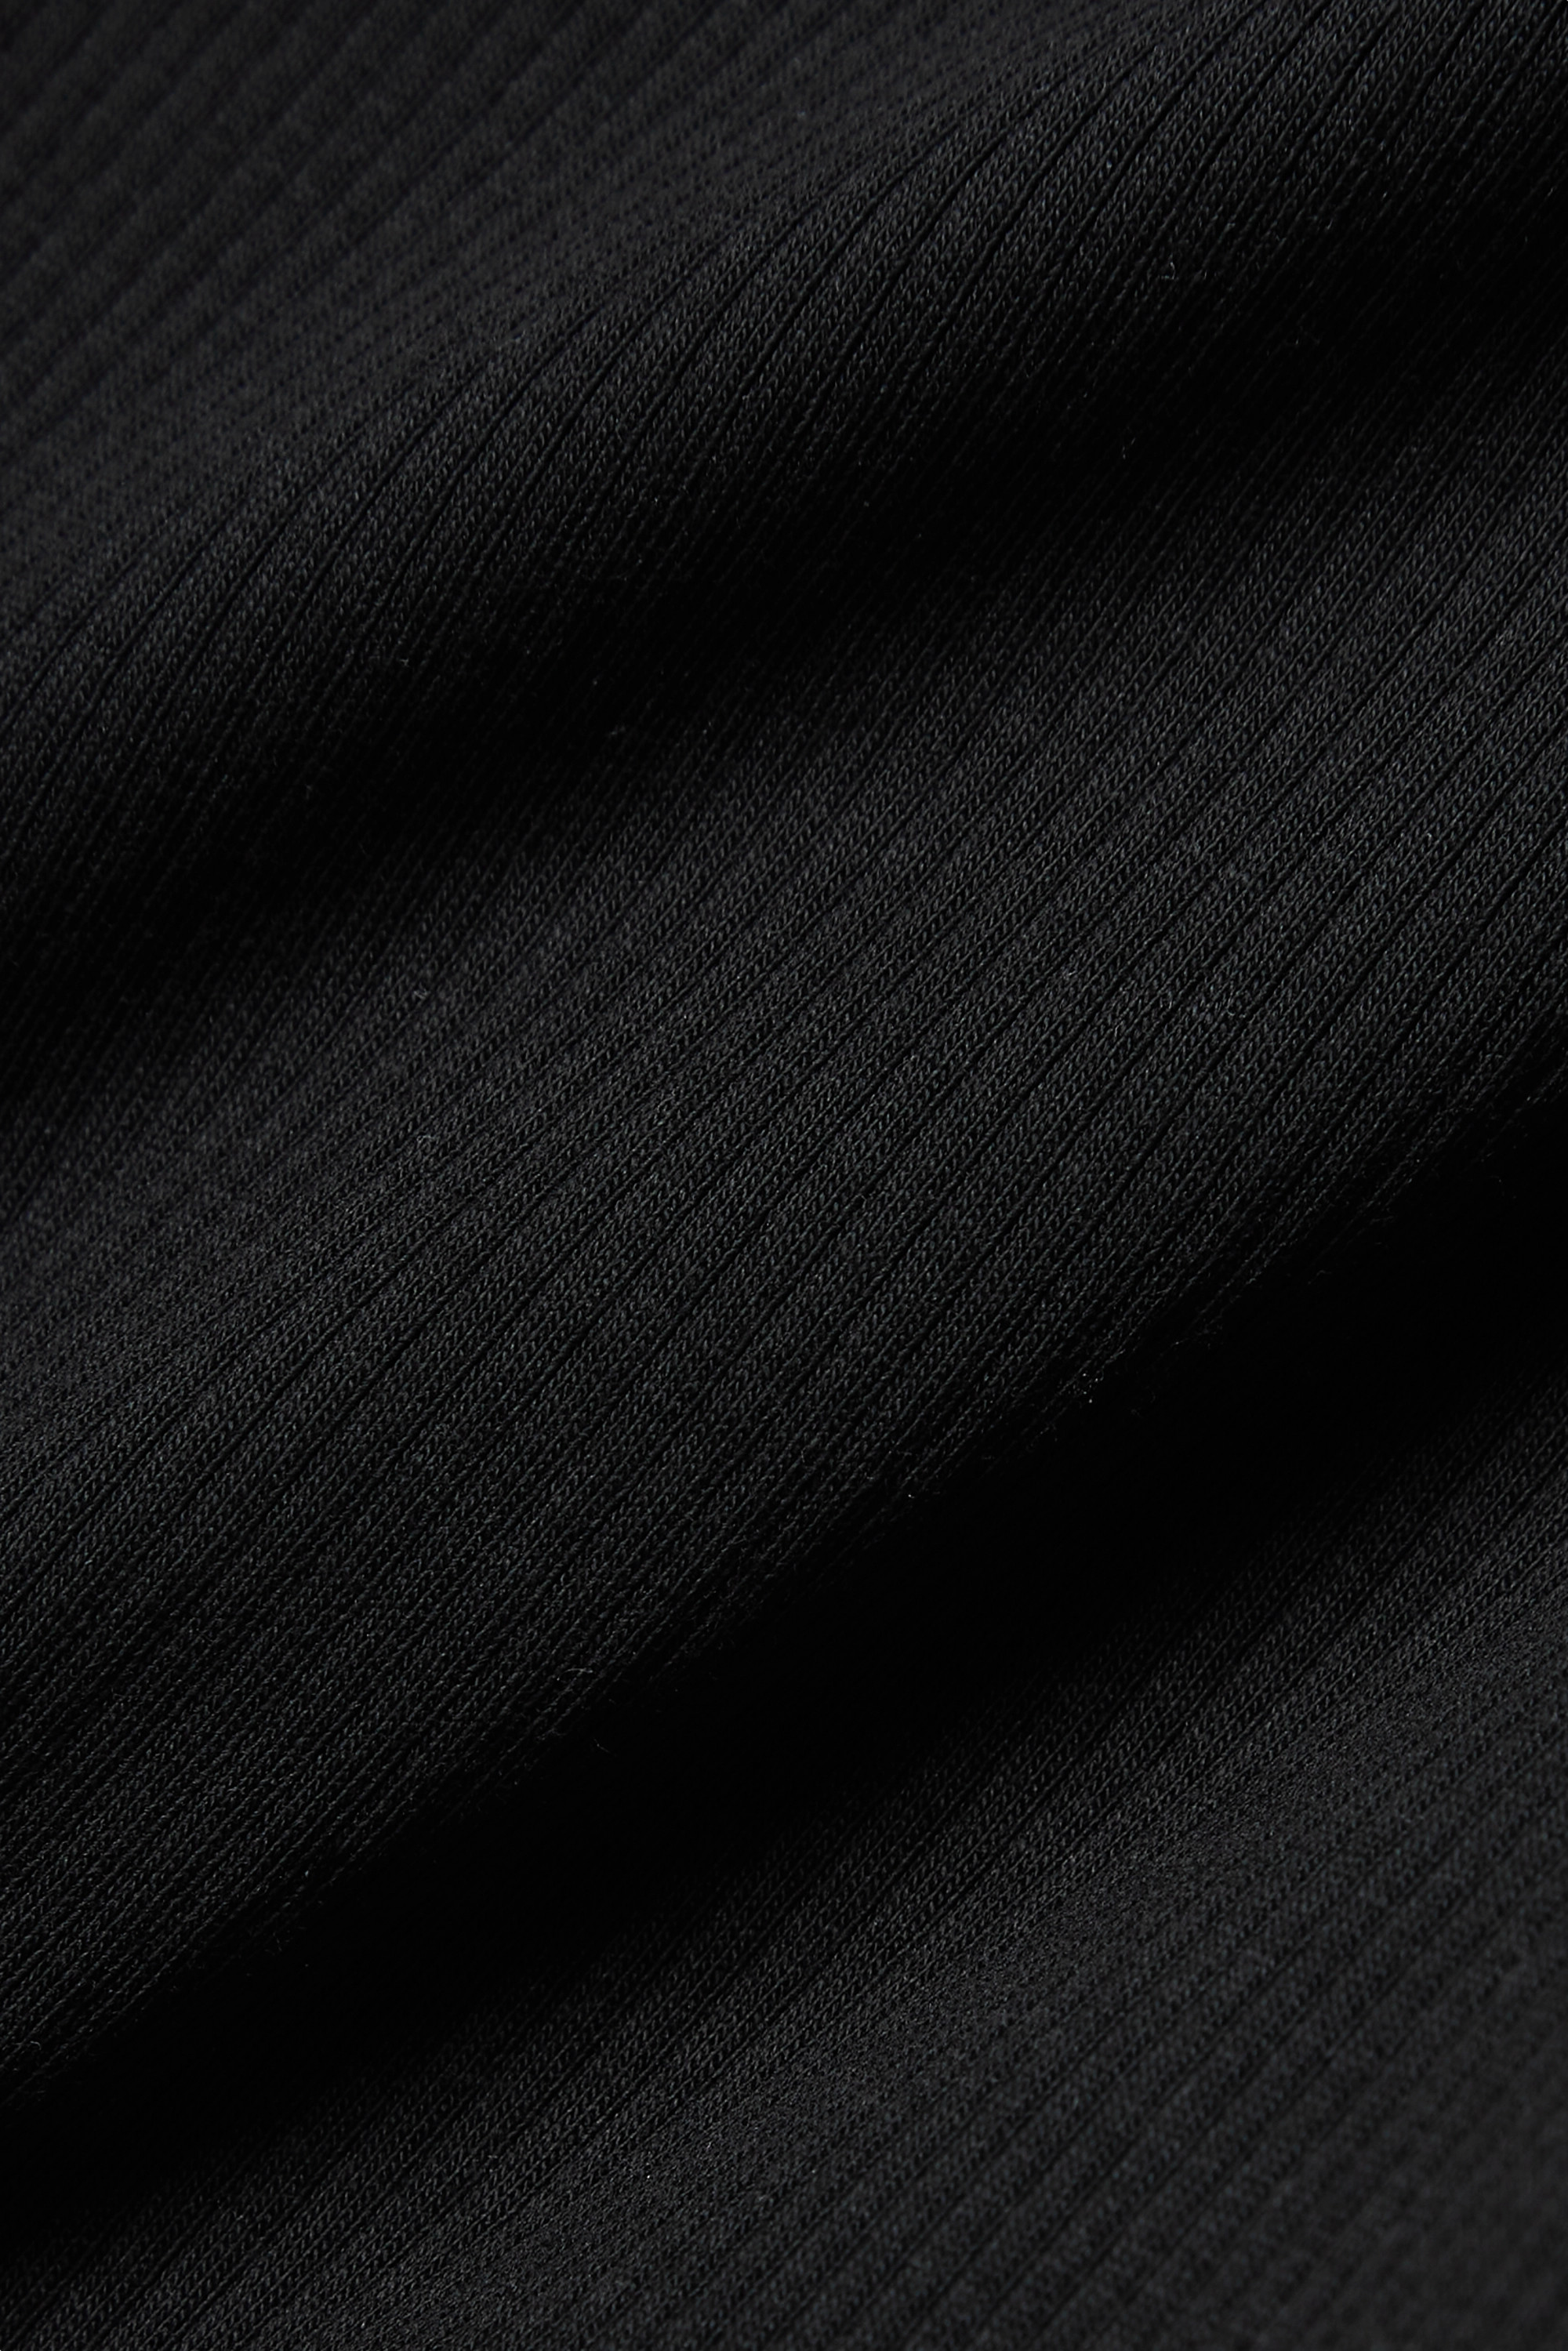 Skin + NET SUSTAIN Ivy ribbed stretch-organic Pima cotton jersey tank